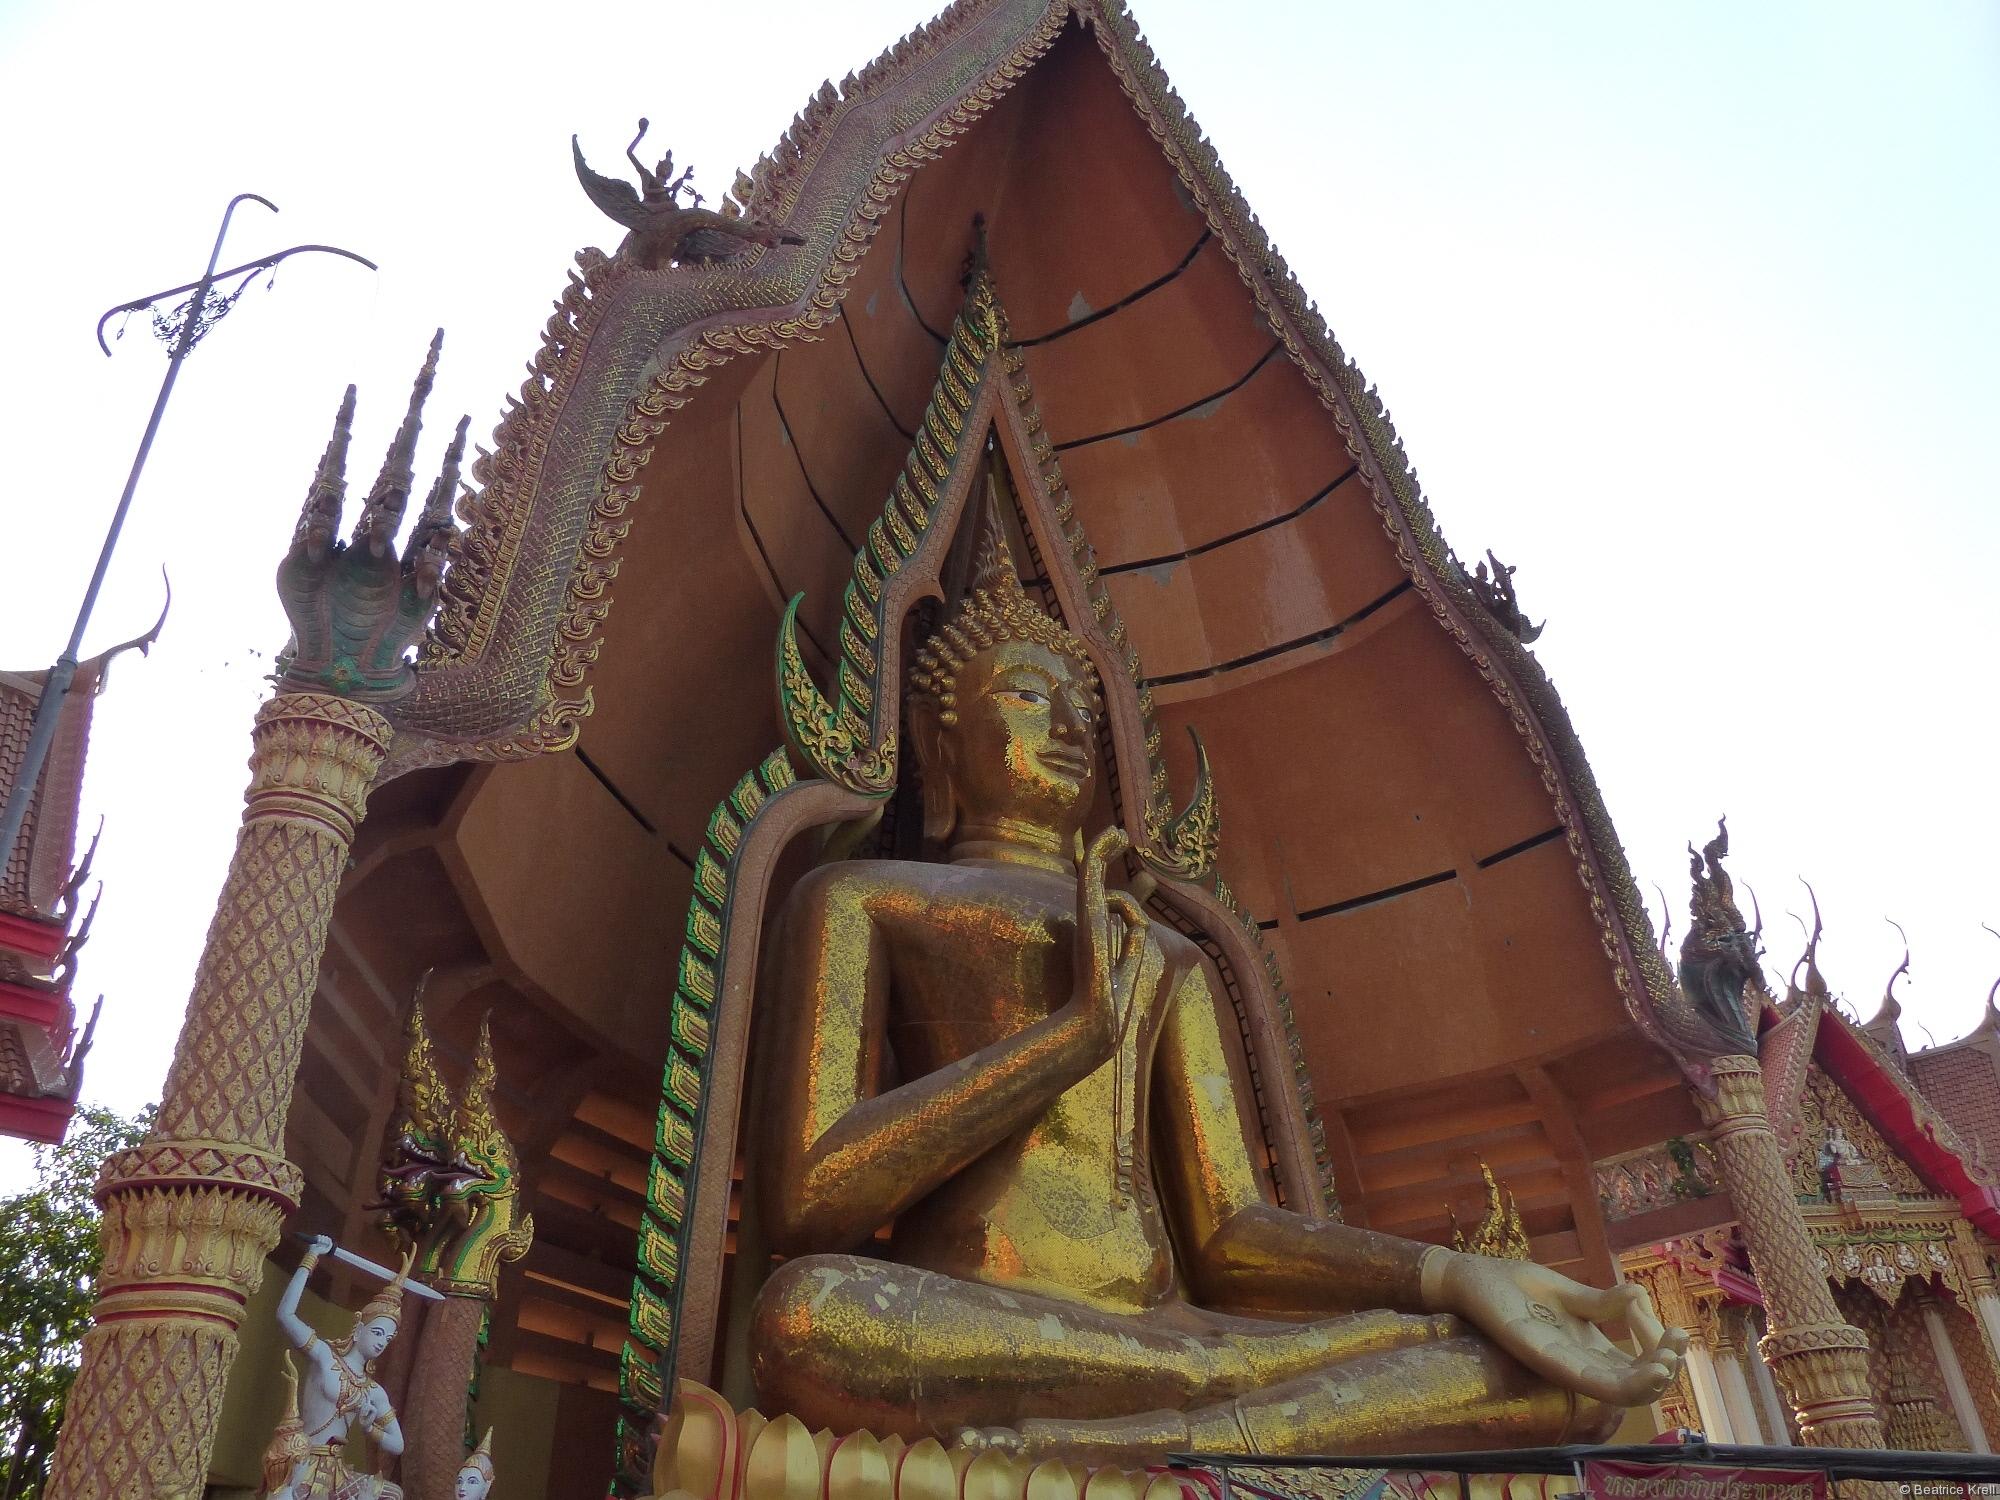 Buddhastatue in Wat Tham Seua